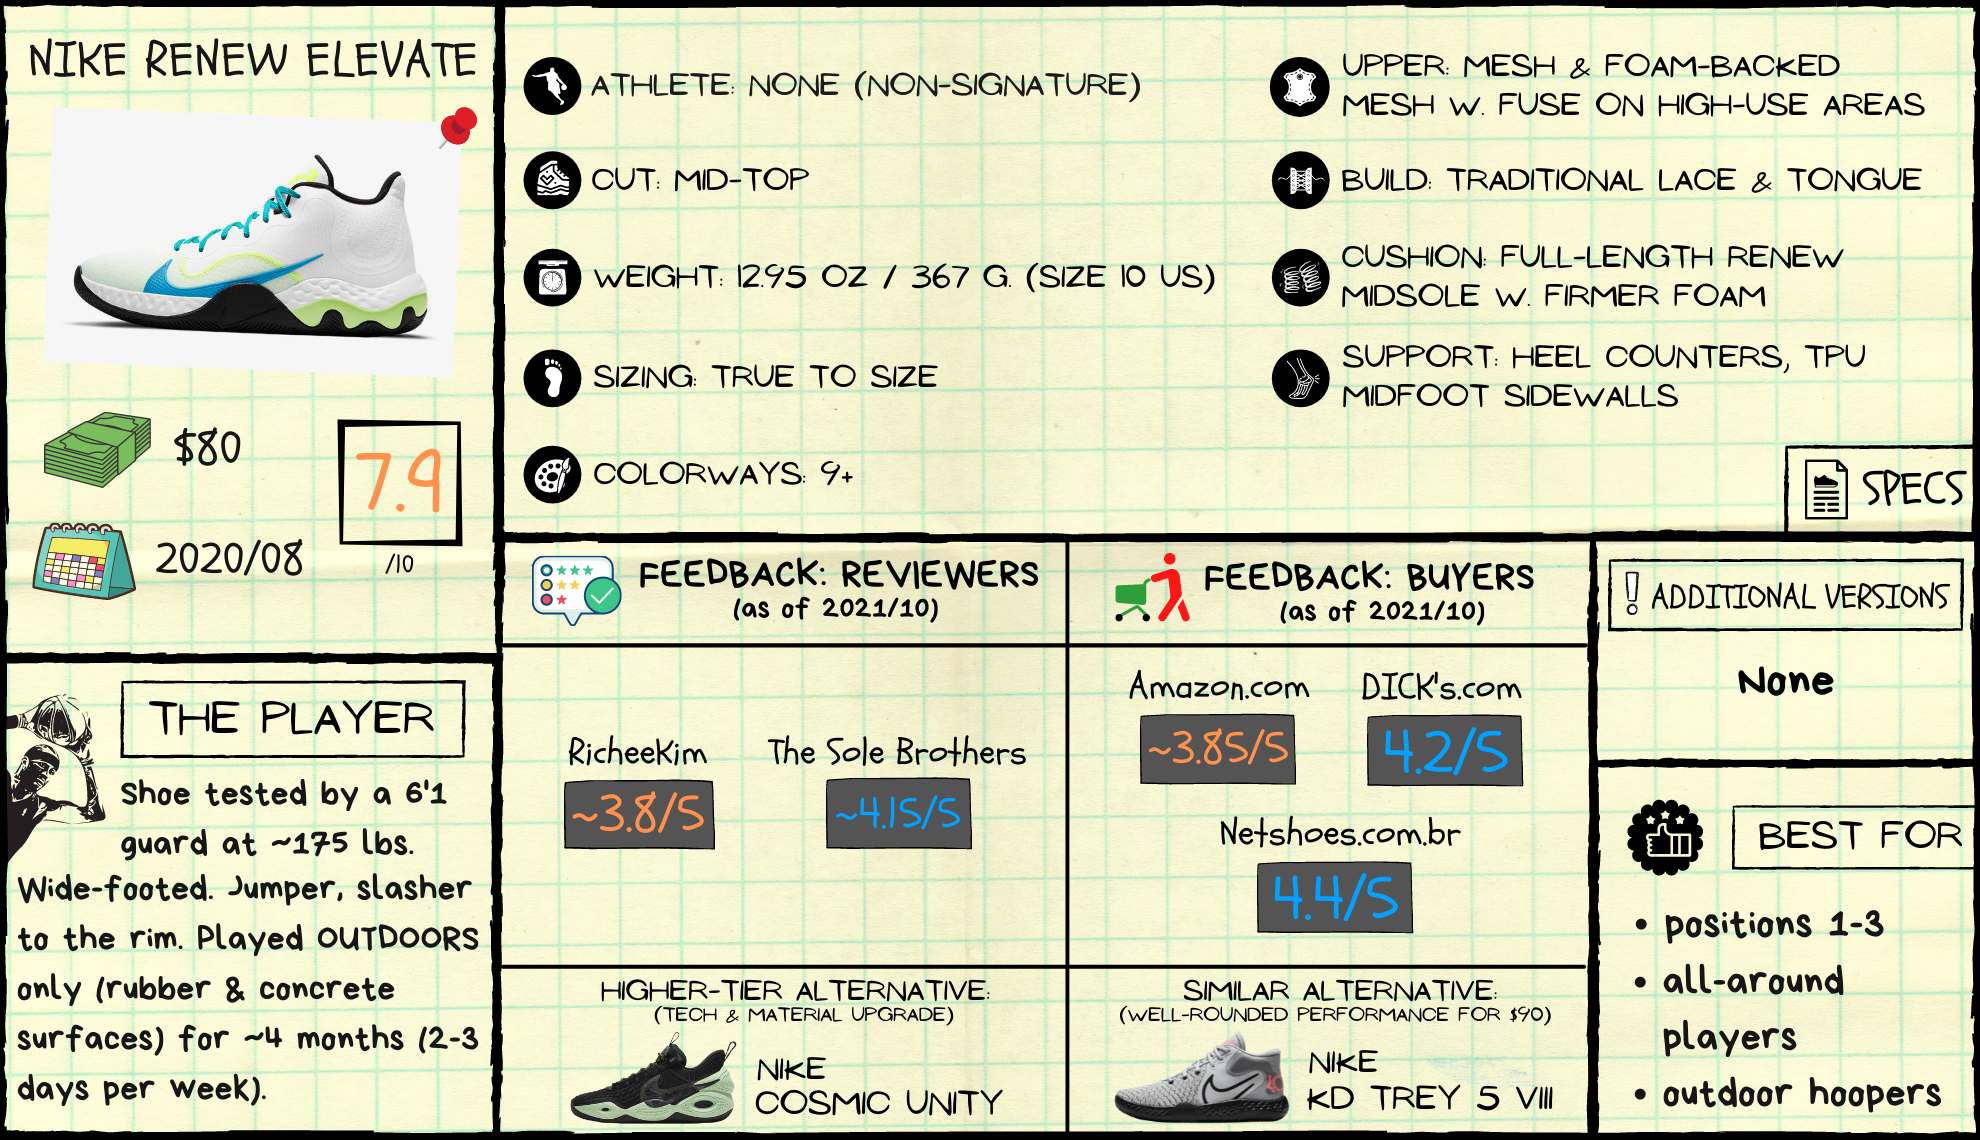 Nike Renew Elevate Review: Spec Sheet